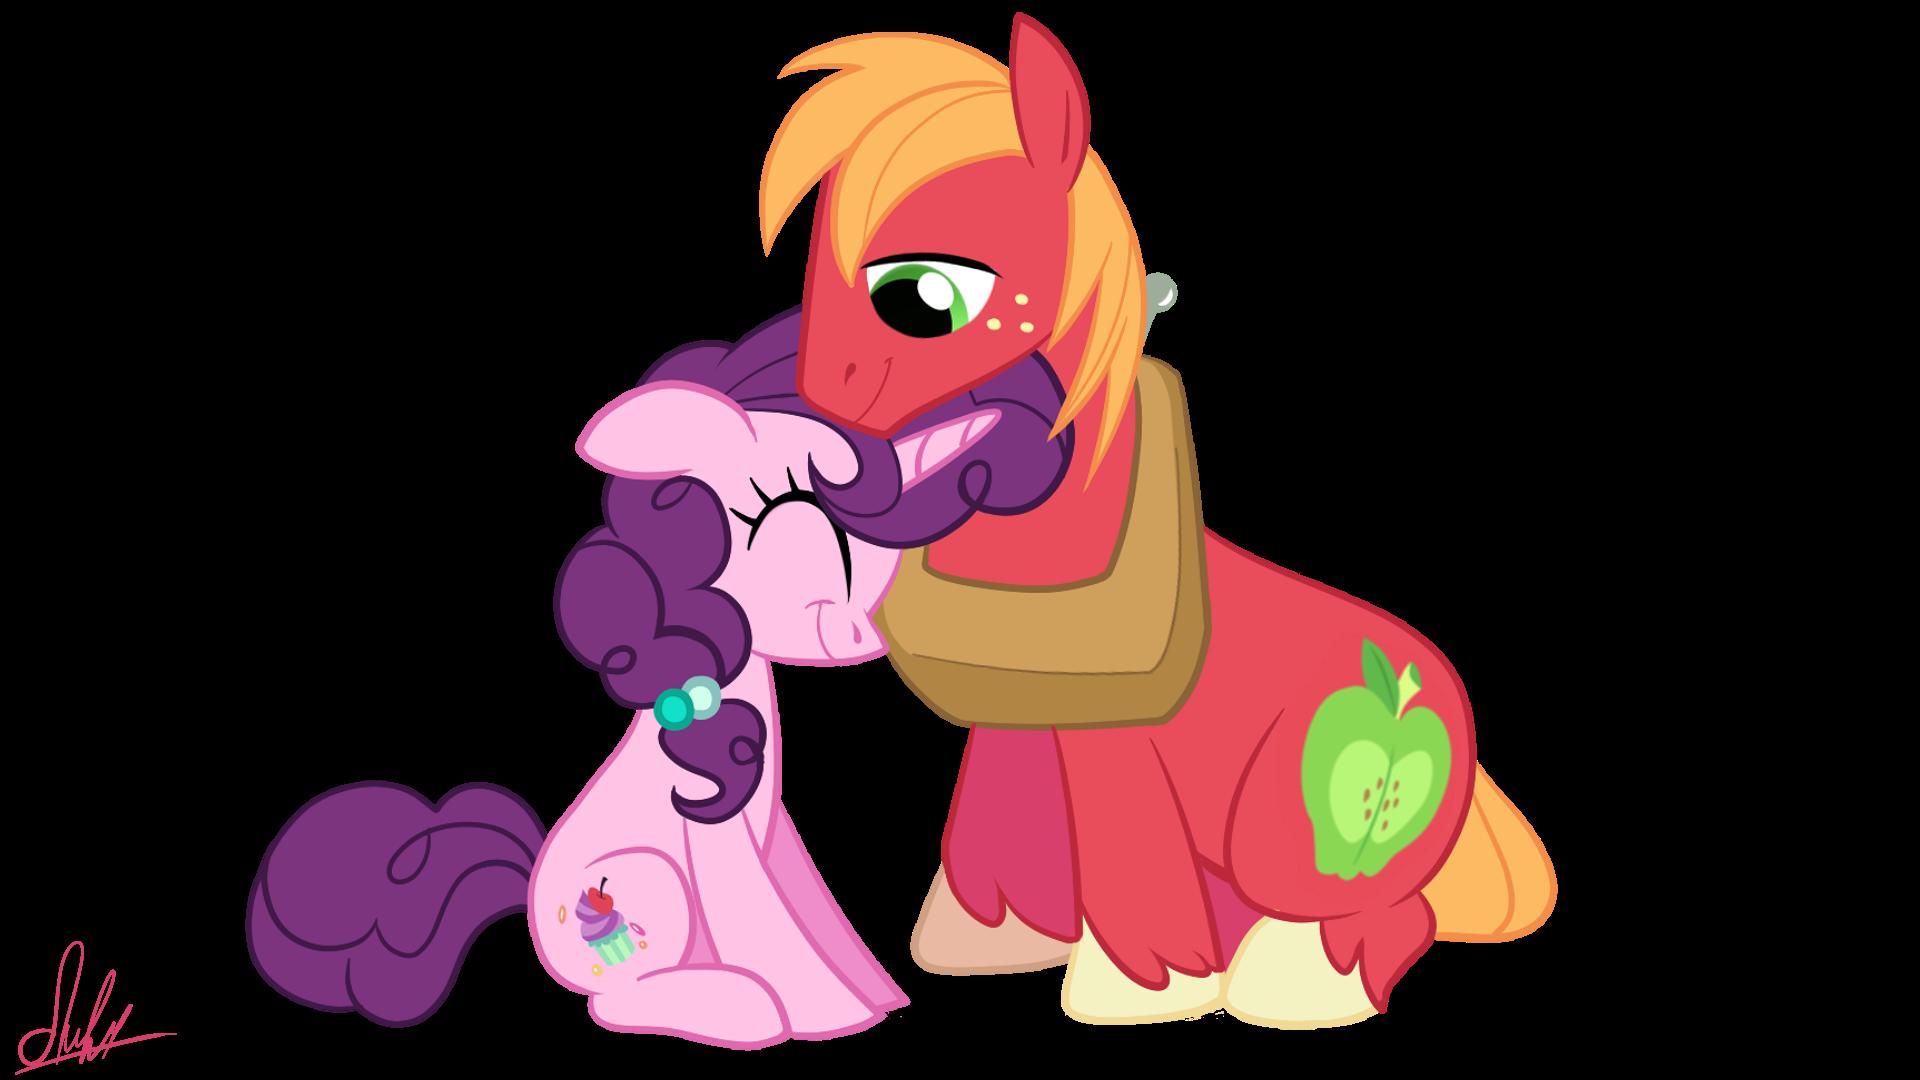 1920x1080 Sugar Belleig Mac My Little Pony Friendship Is Magic Roleplay